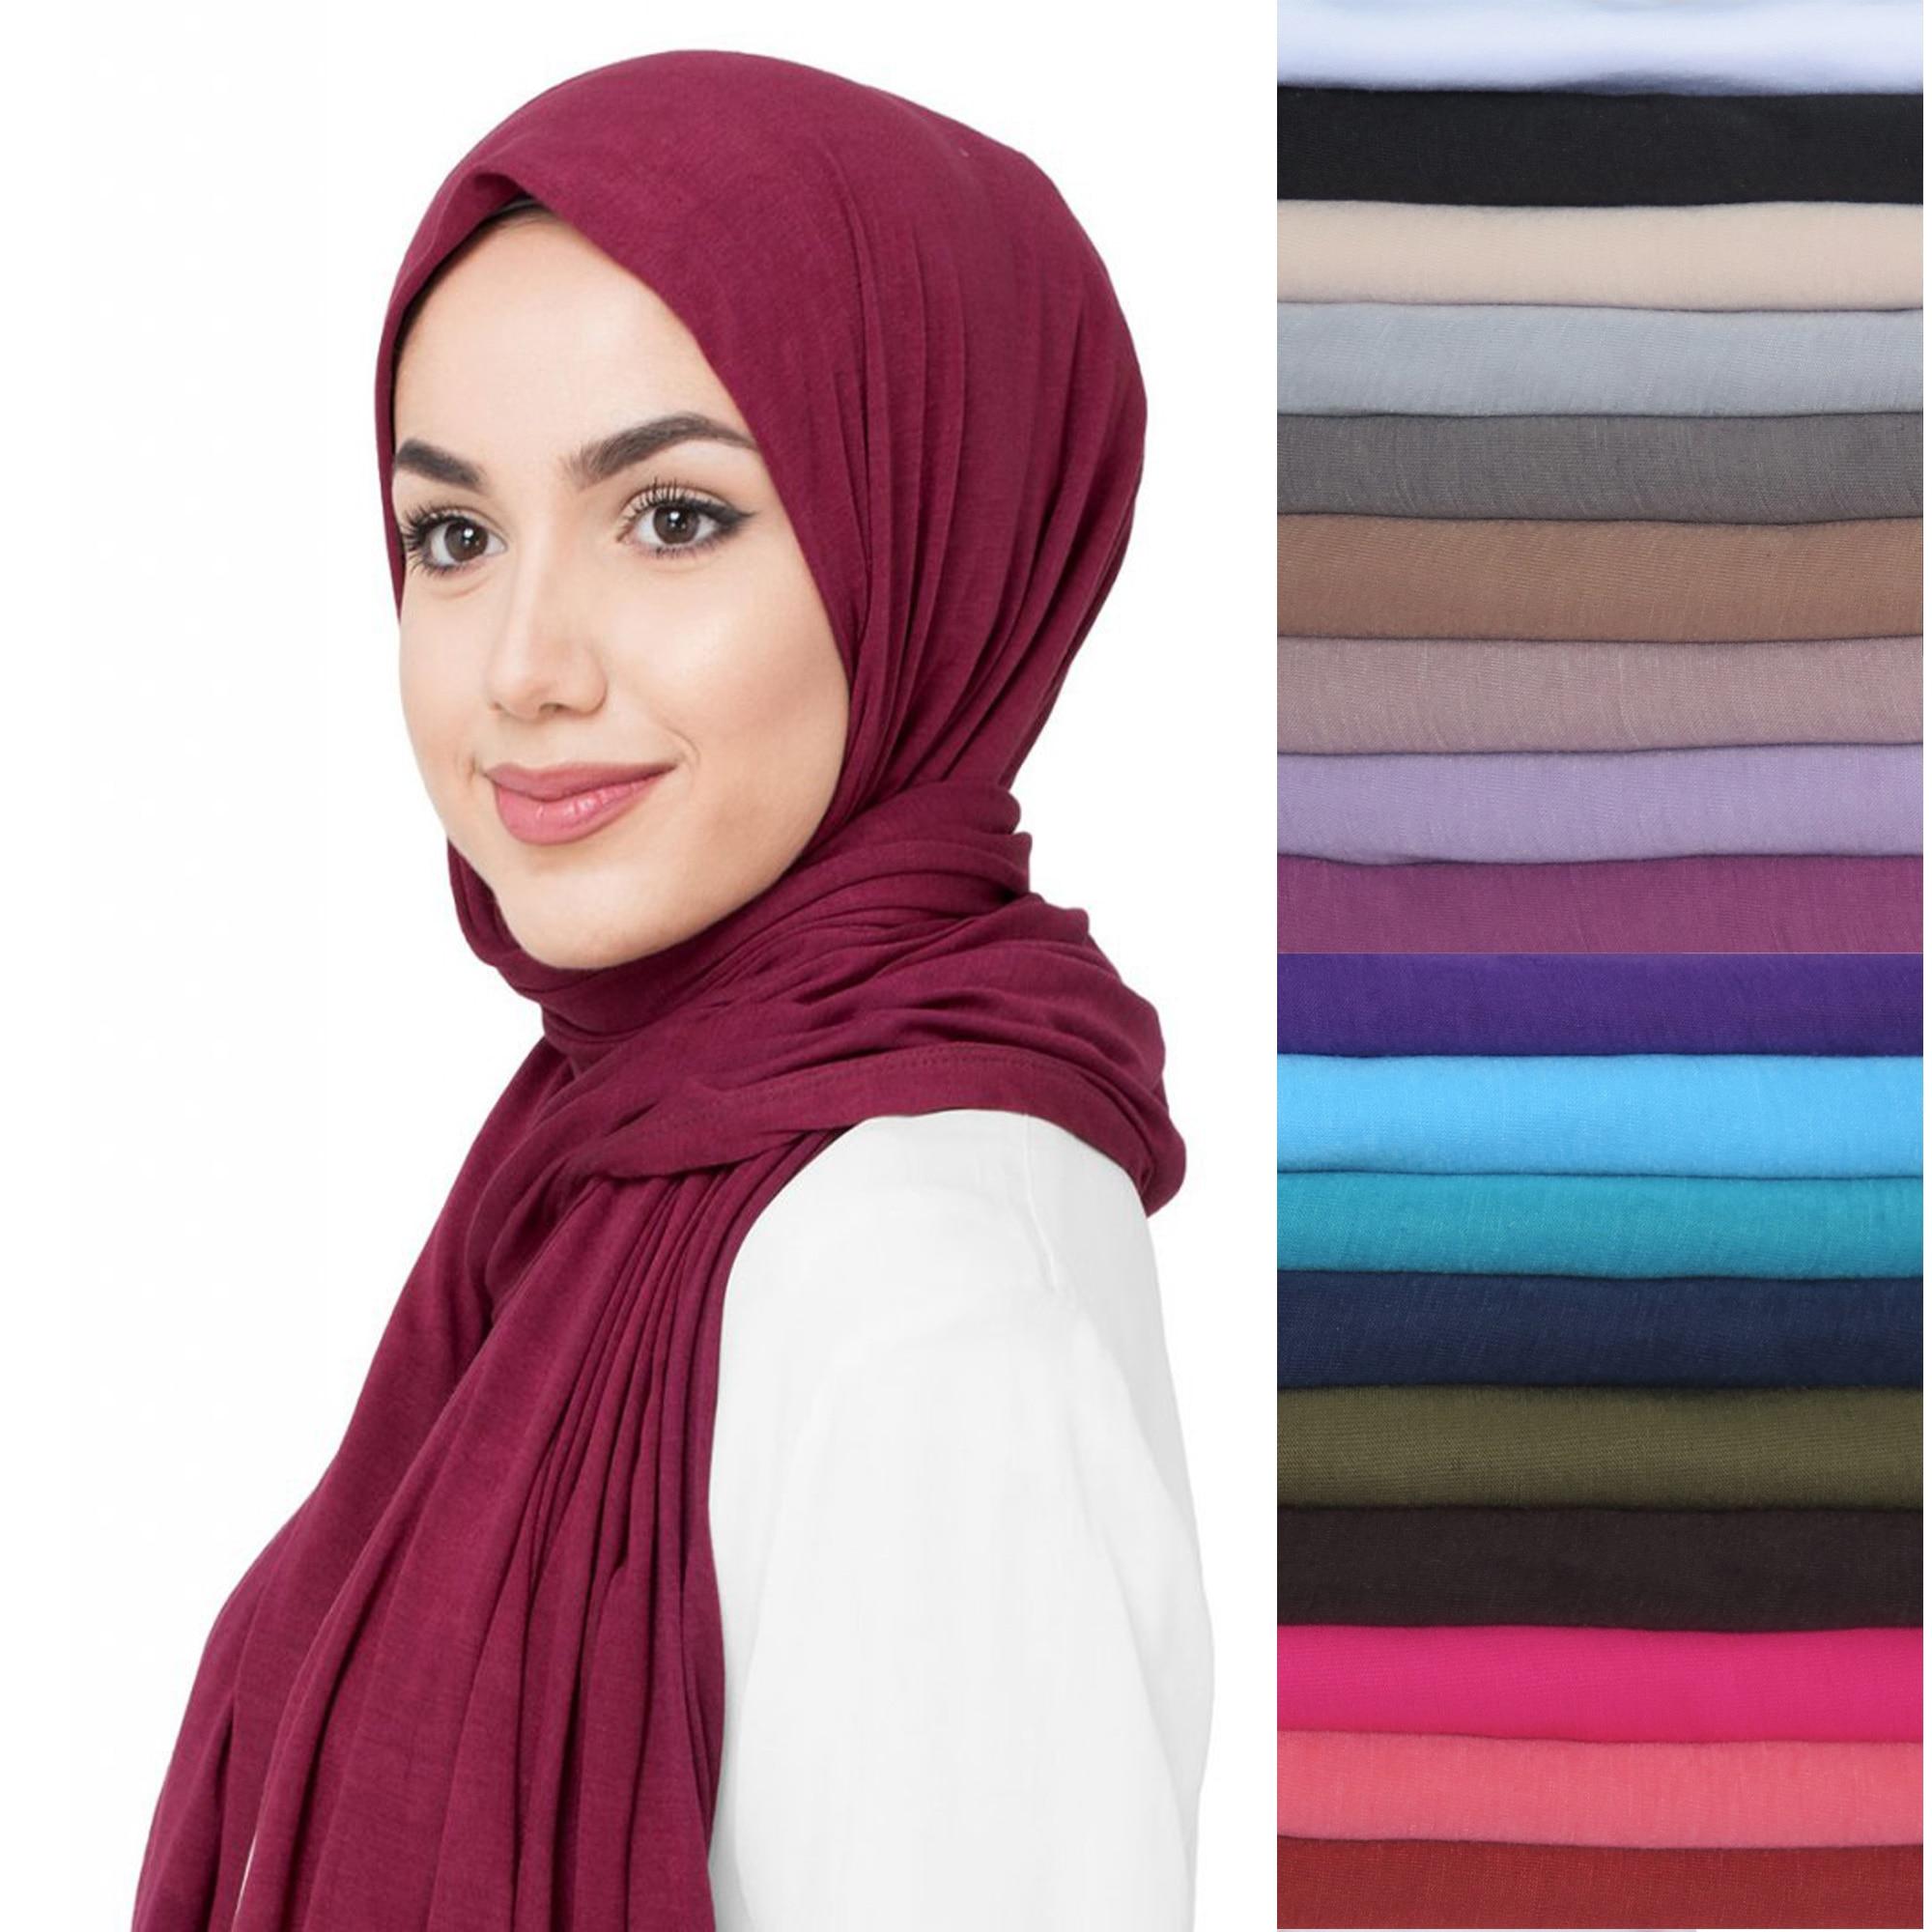 10pcs lot Premium Jersey Stretchy Fabric Muslim Hijab Head Scarf Shawl Wrap Turban Solid Colors